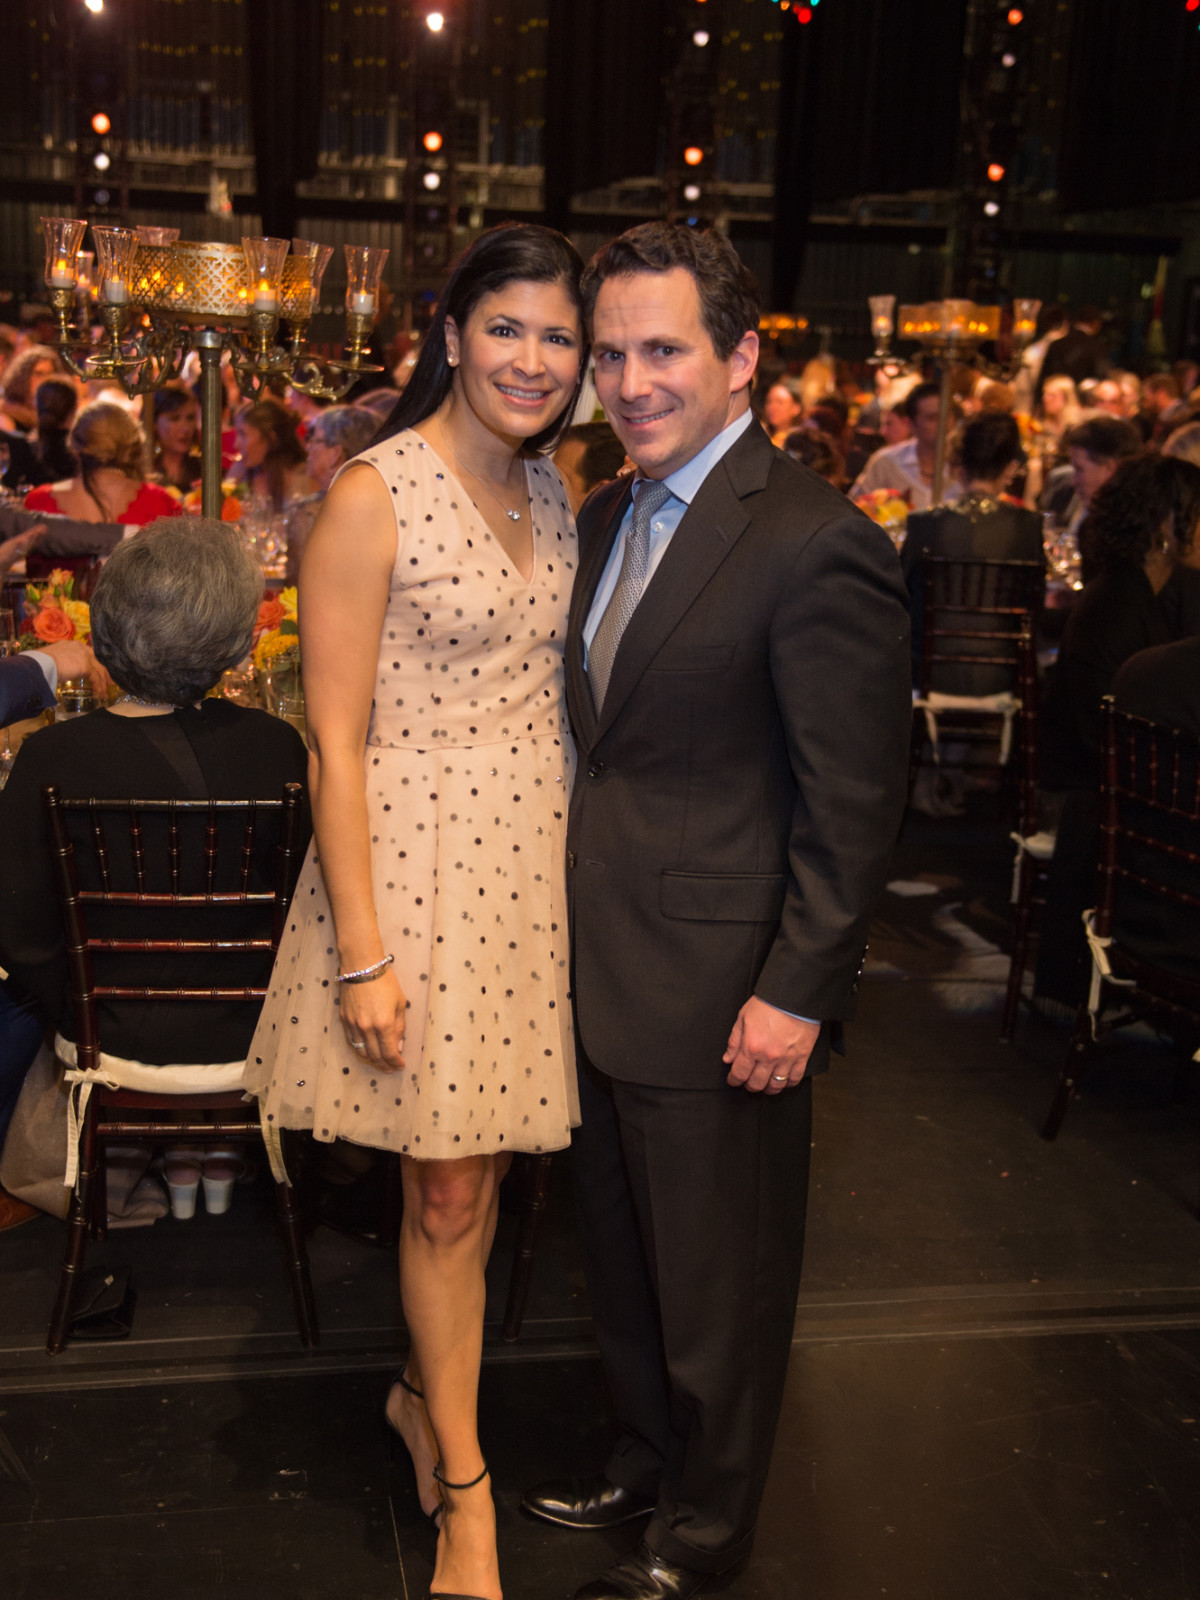 Kristy and Chris Bradshaw at Houston Ballet Opening NIght Dinner